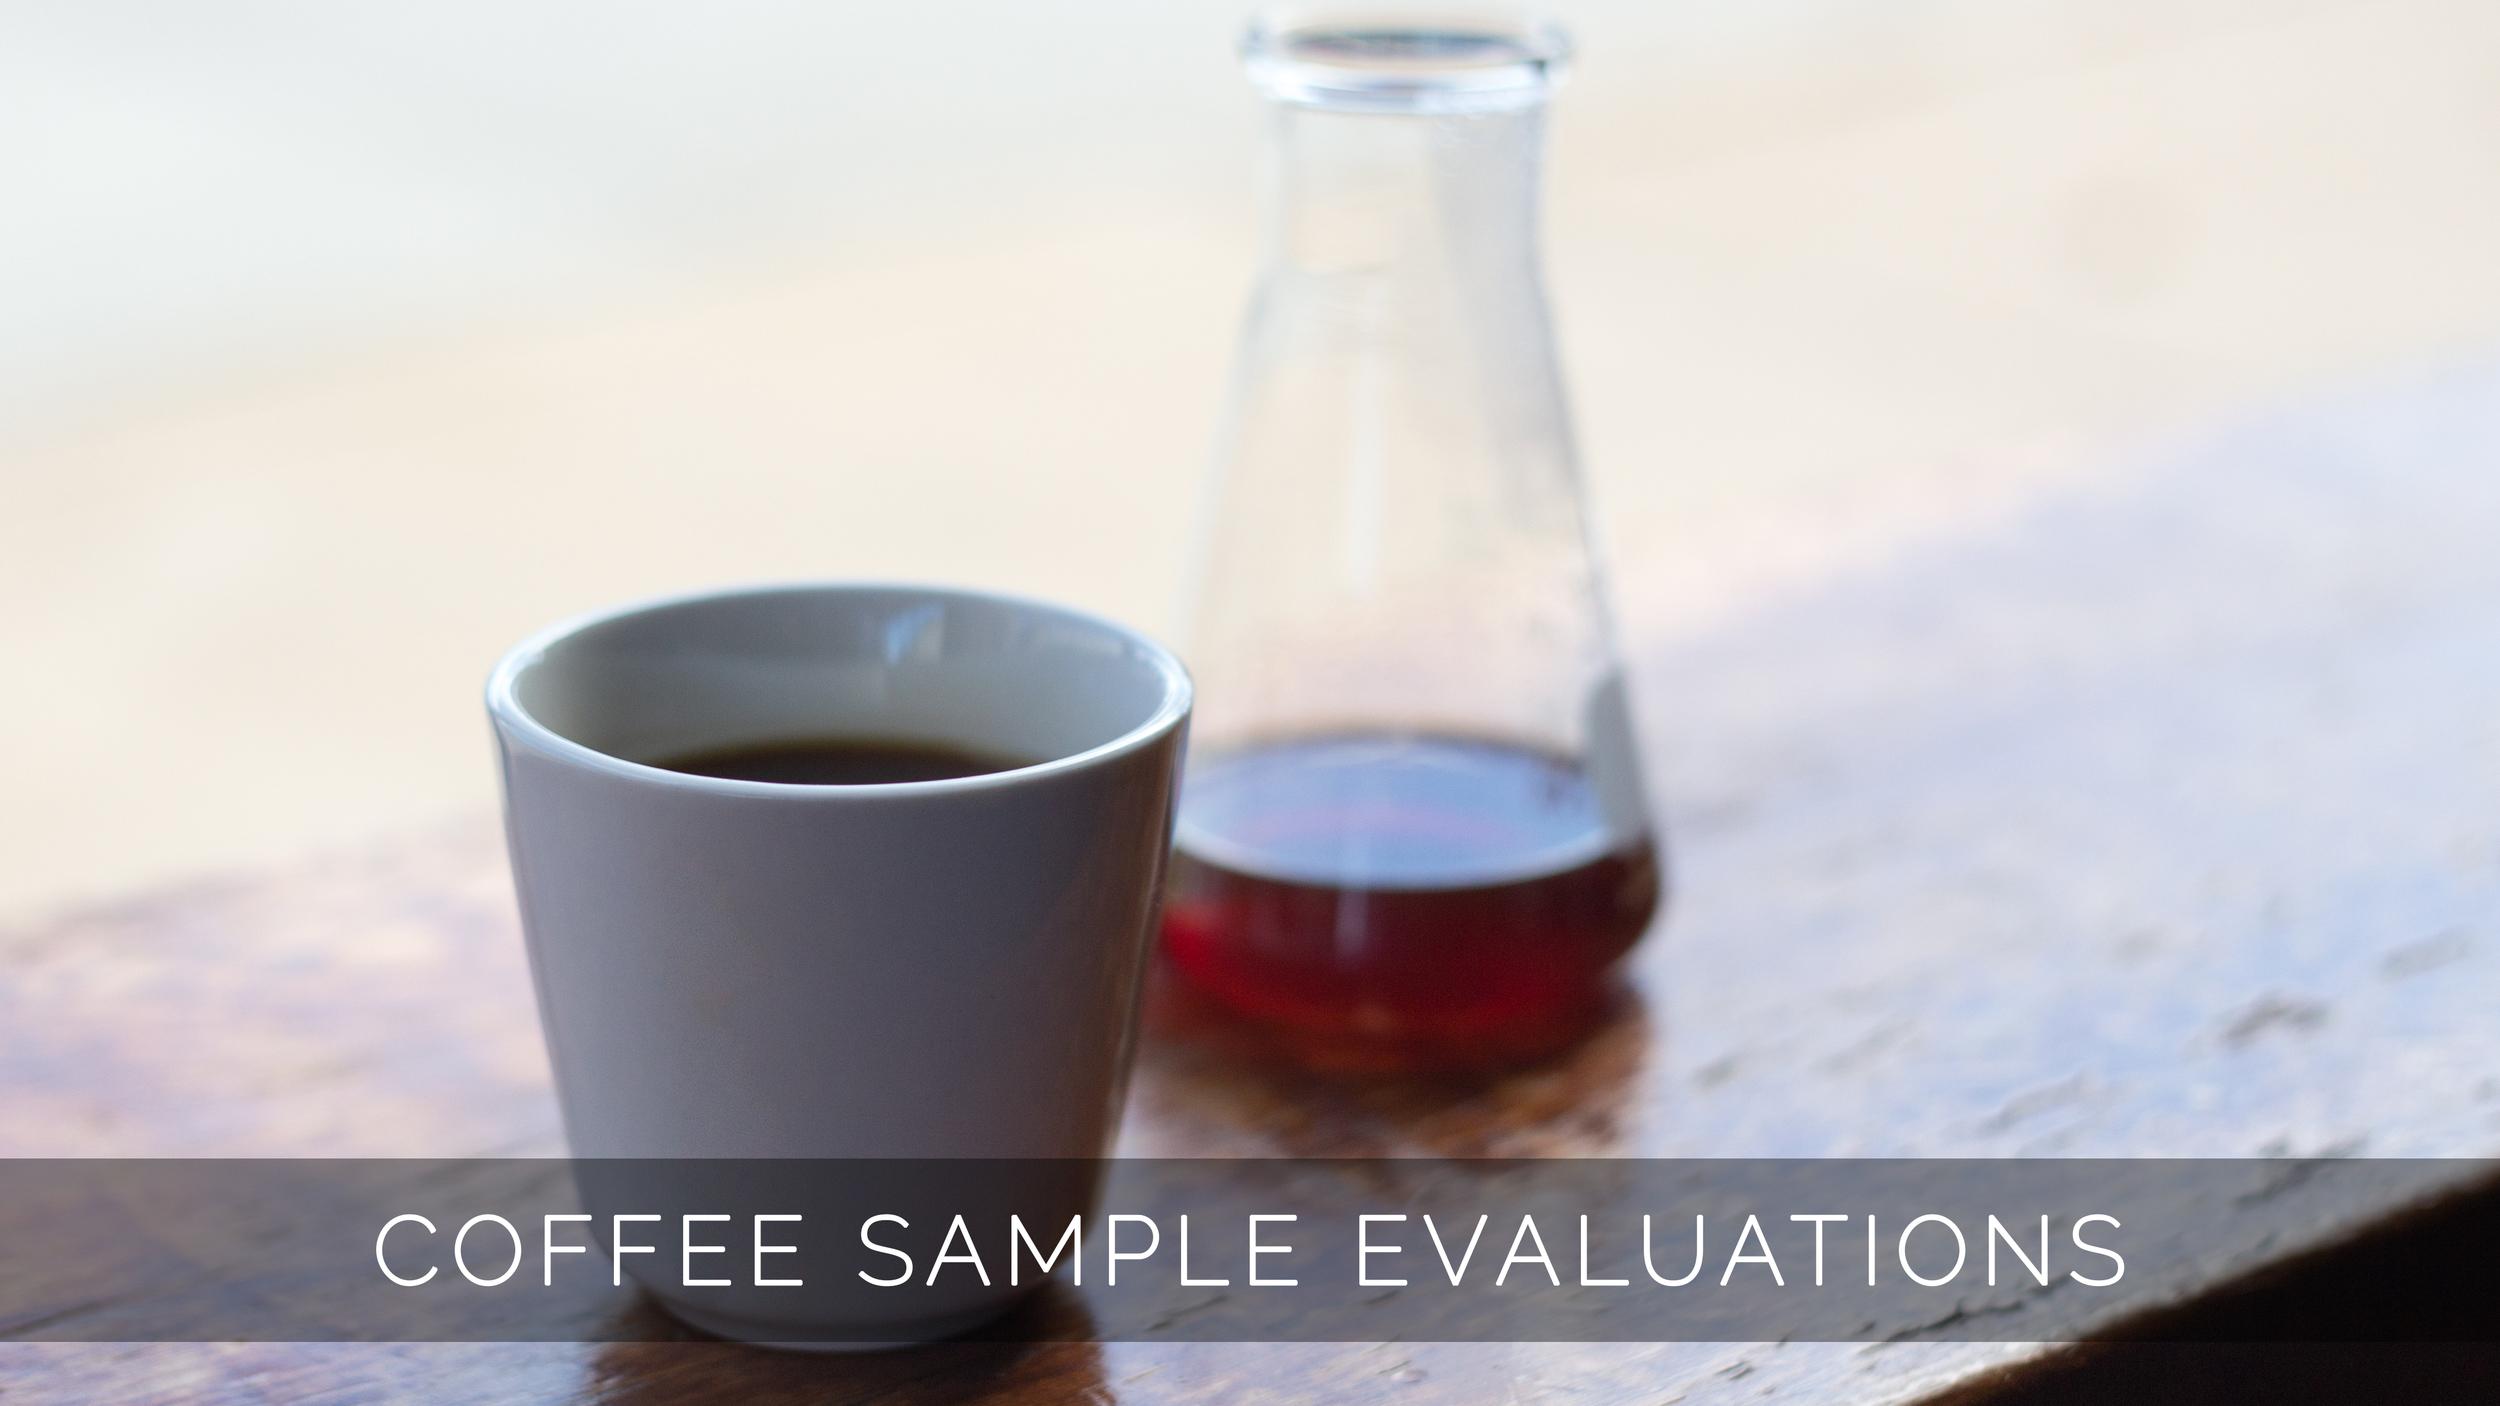 Coffee Sample Evaluation